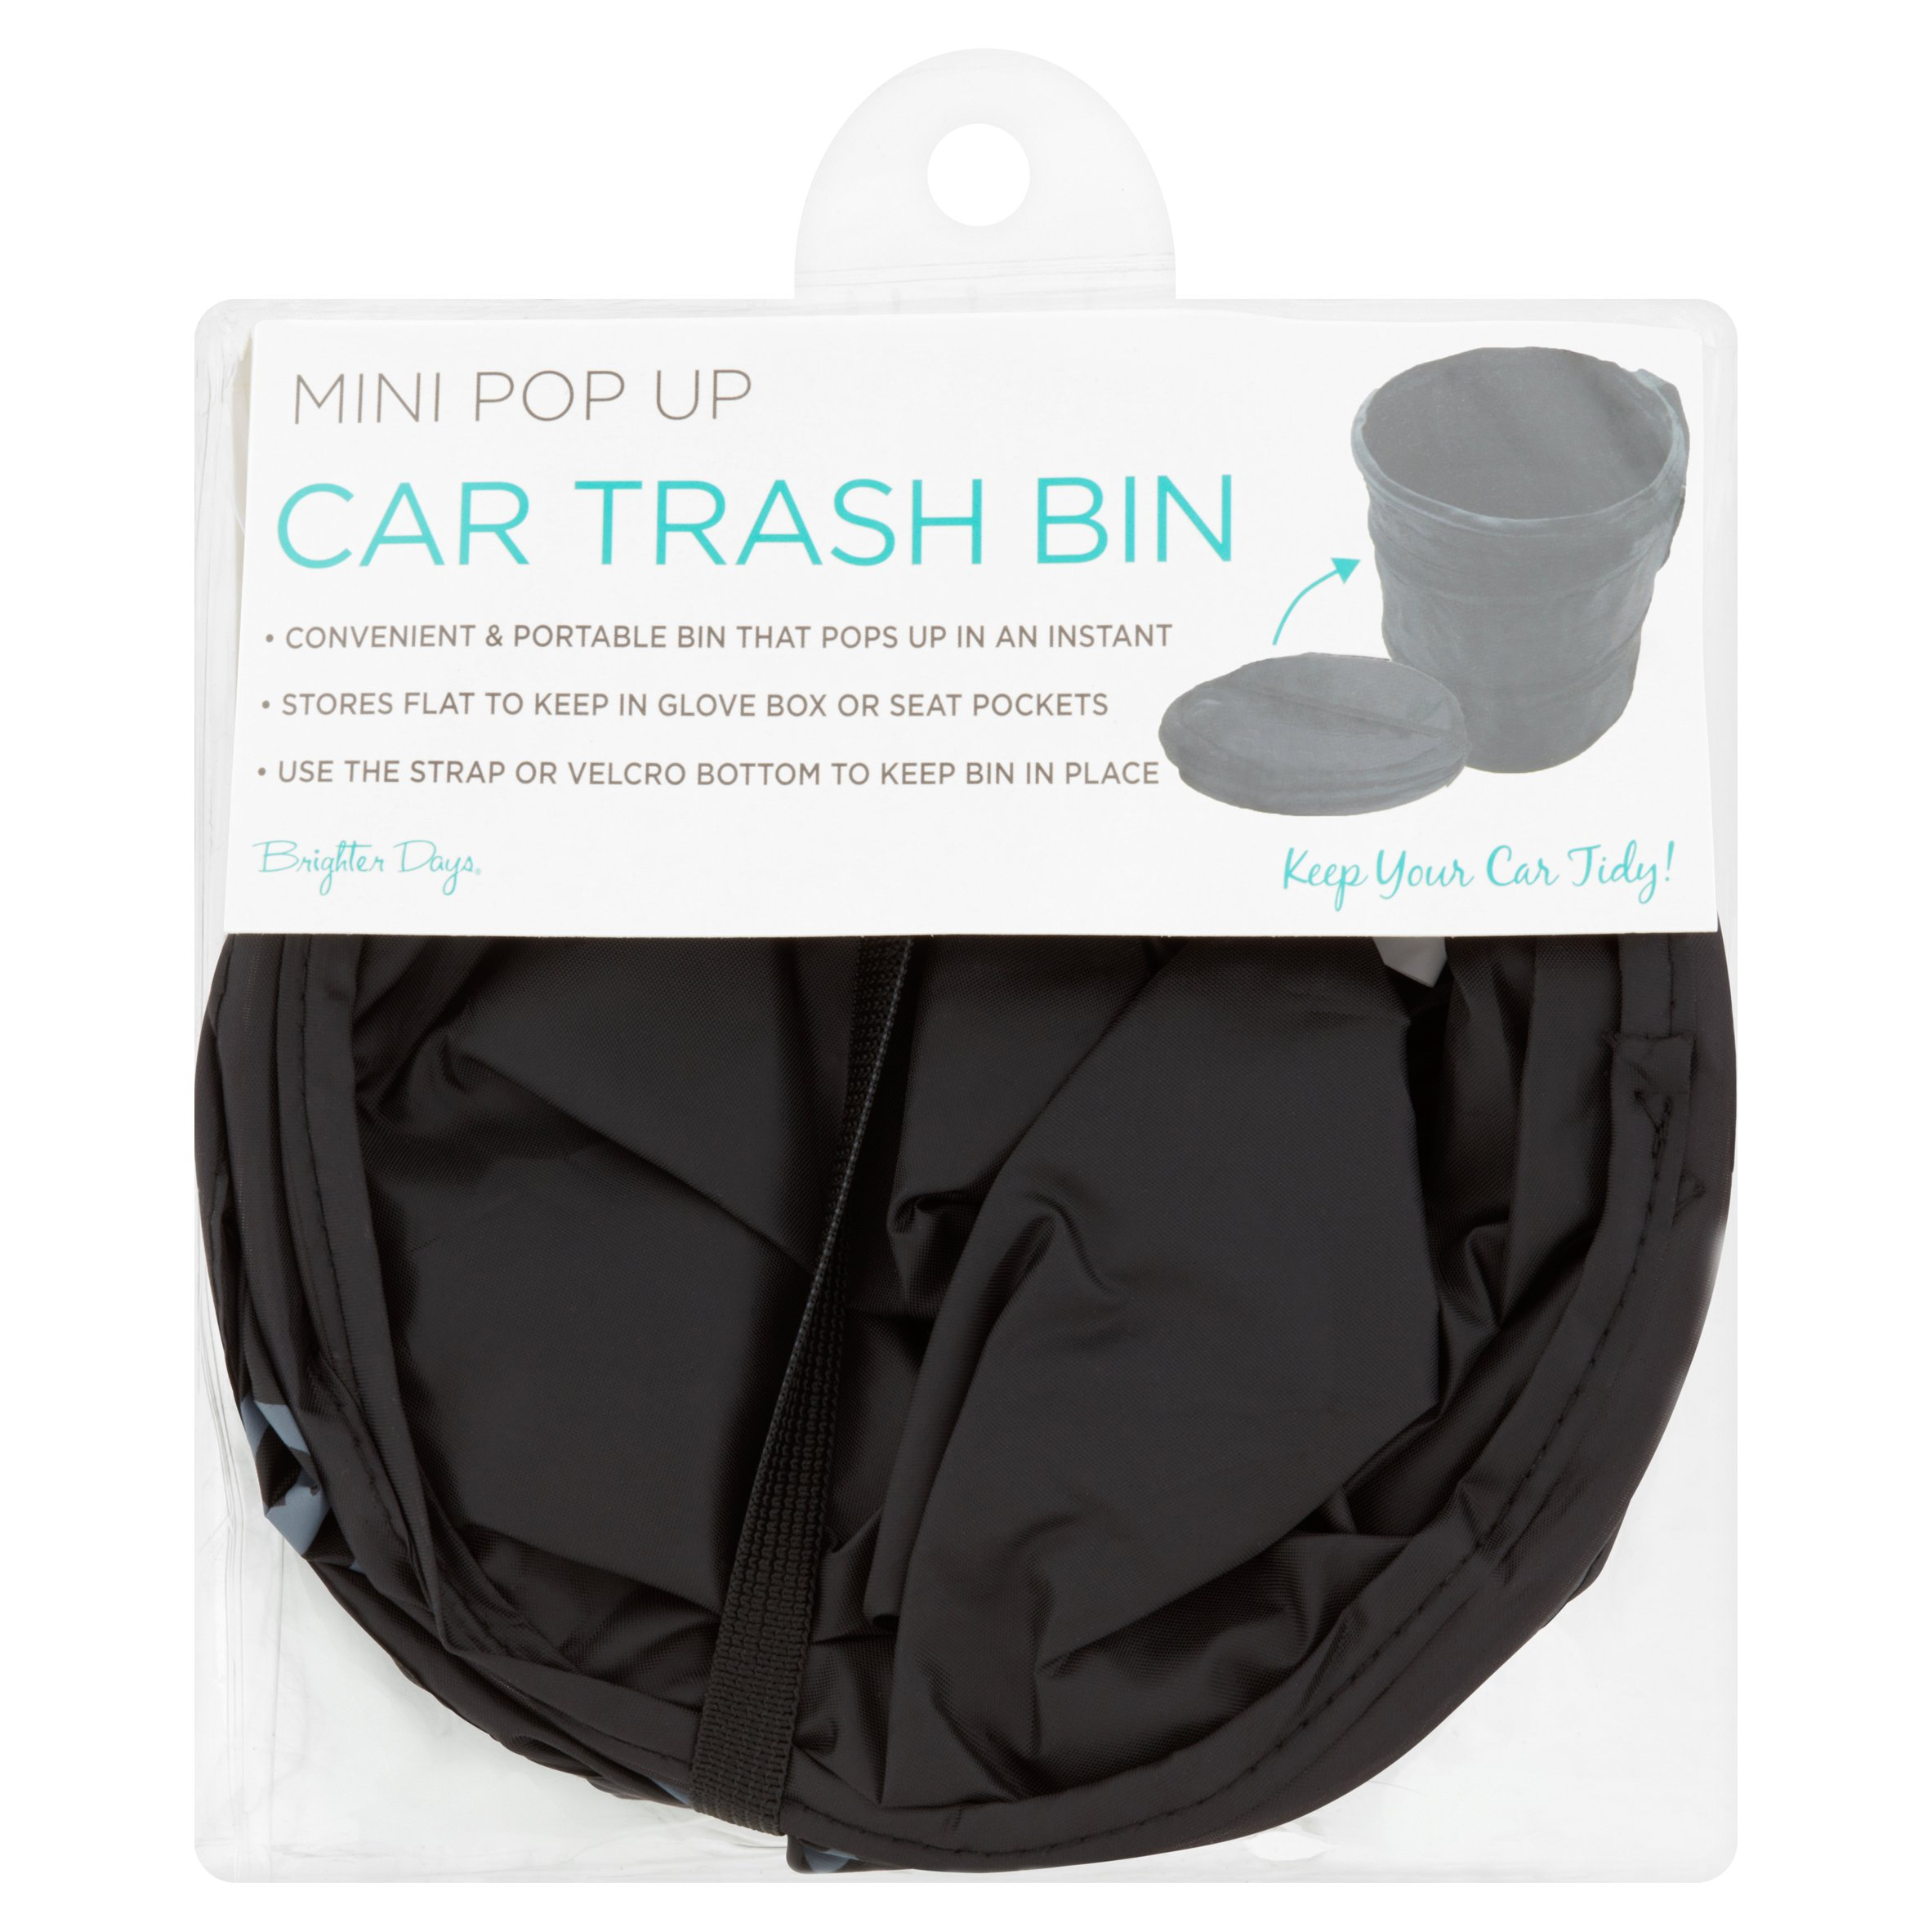 Brighter Days Mini Pop Up Car Trash Bin by